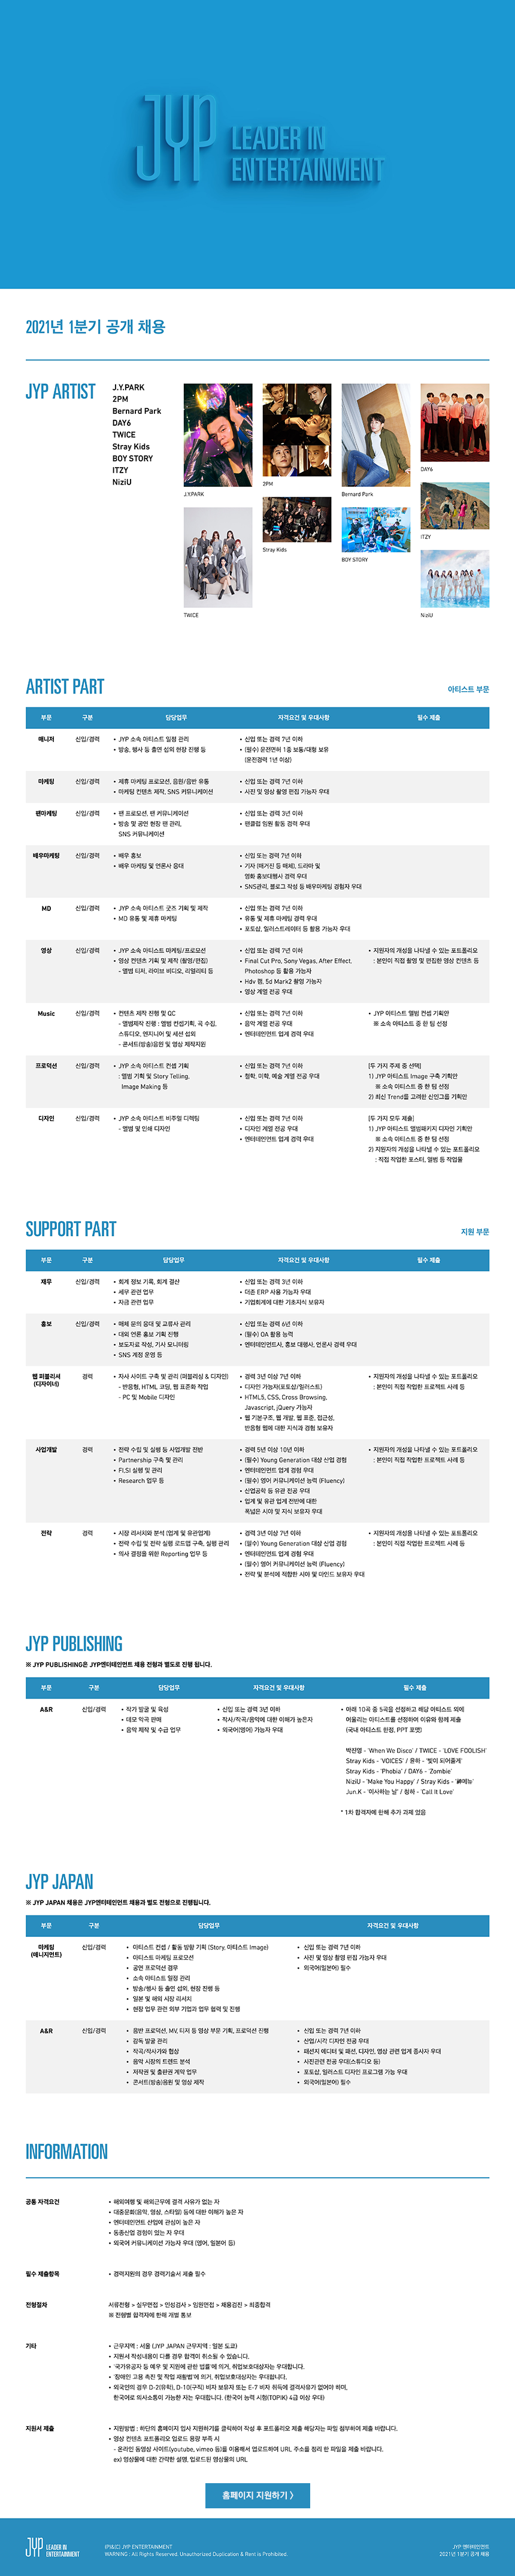 JYP엔터테인먼트 2021년 1분기 공개채용